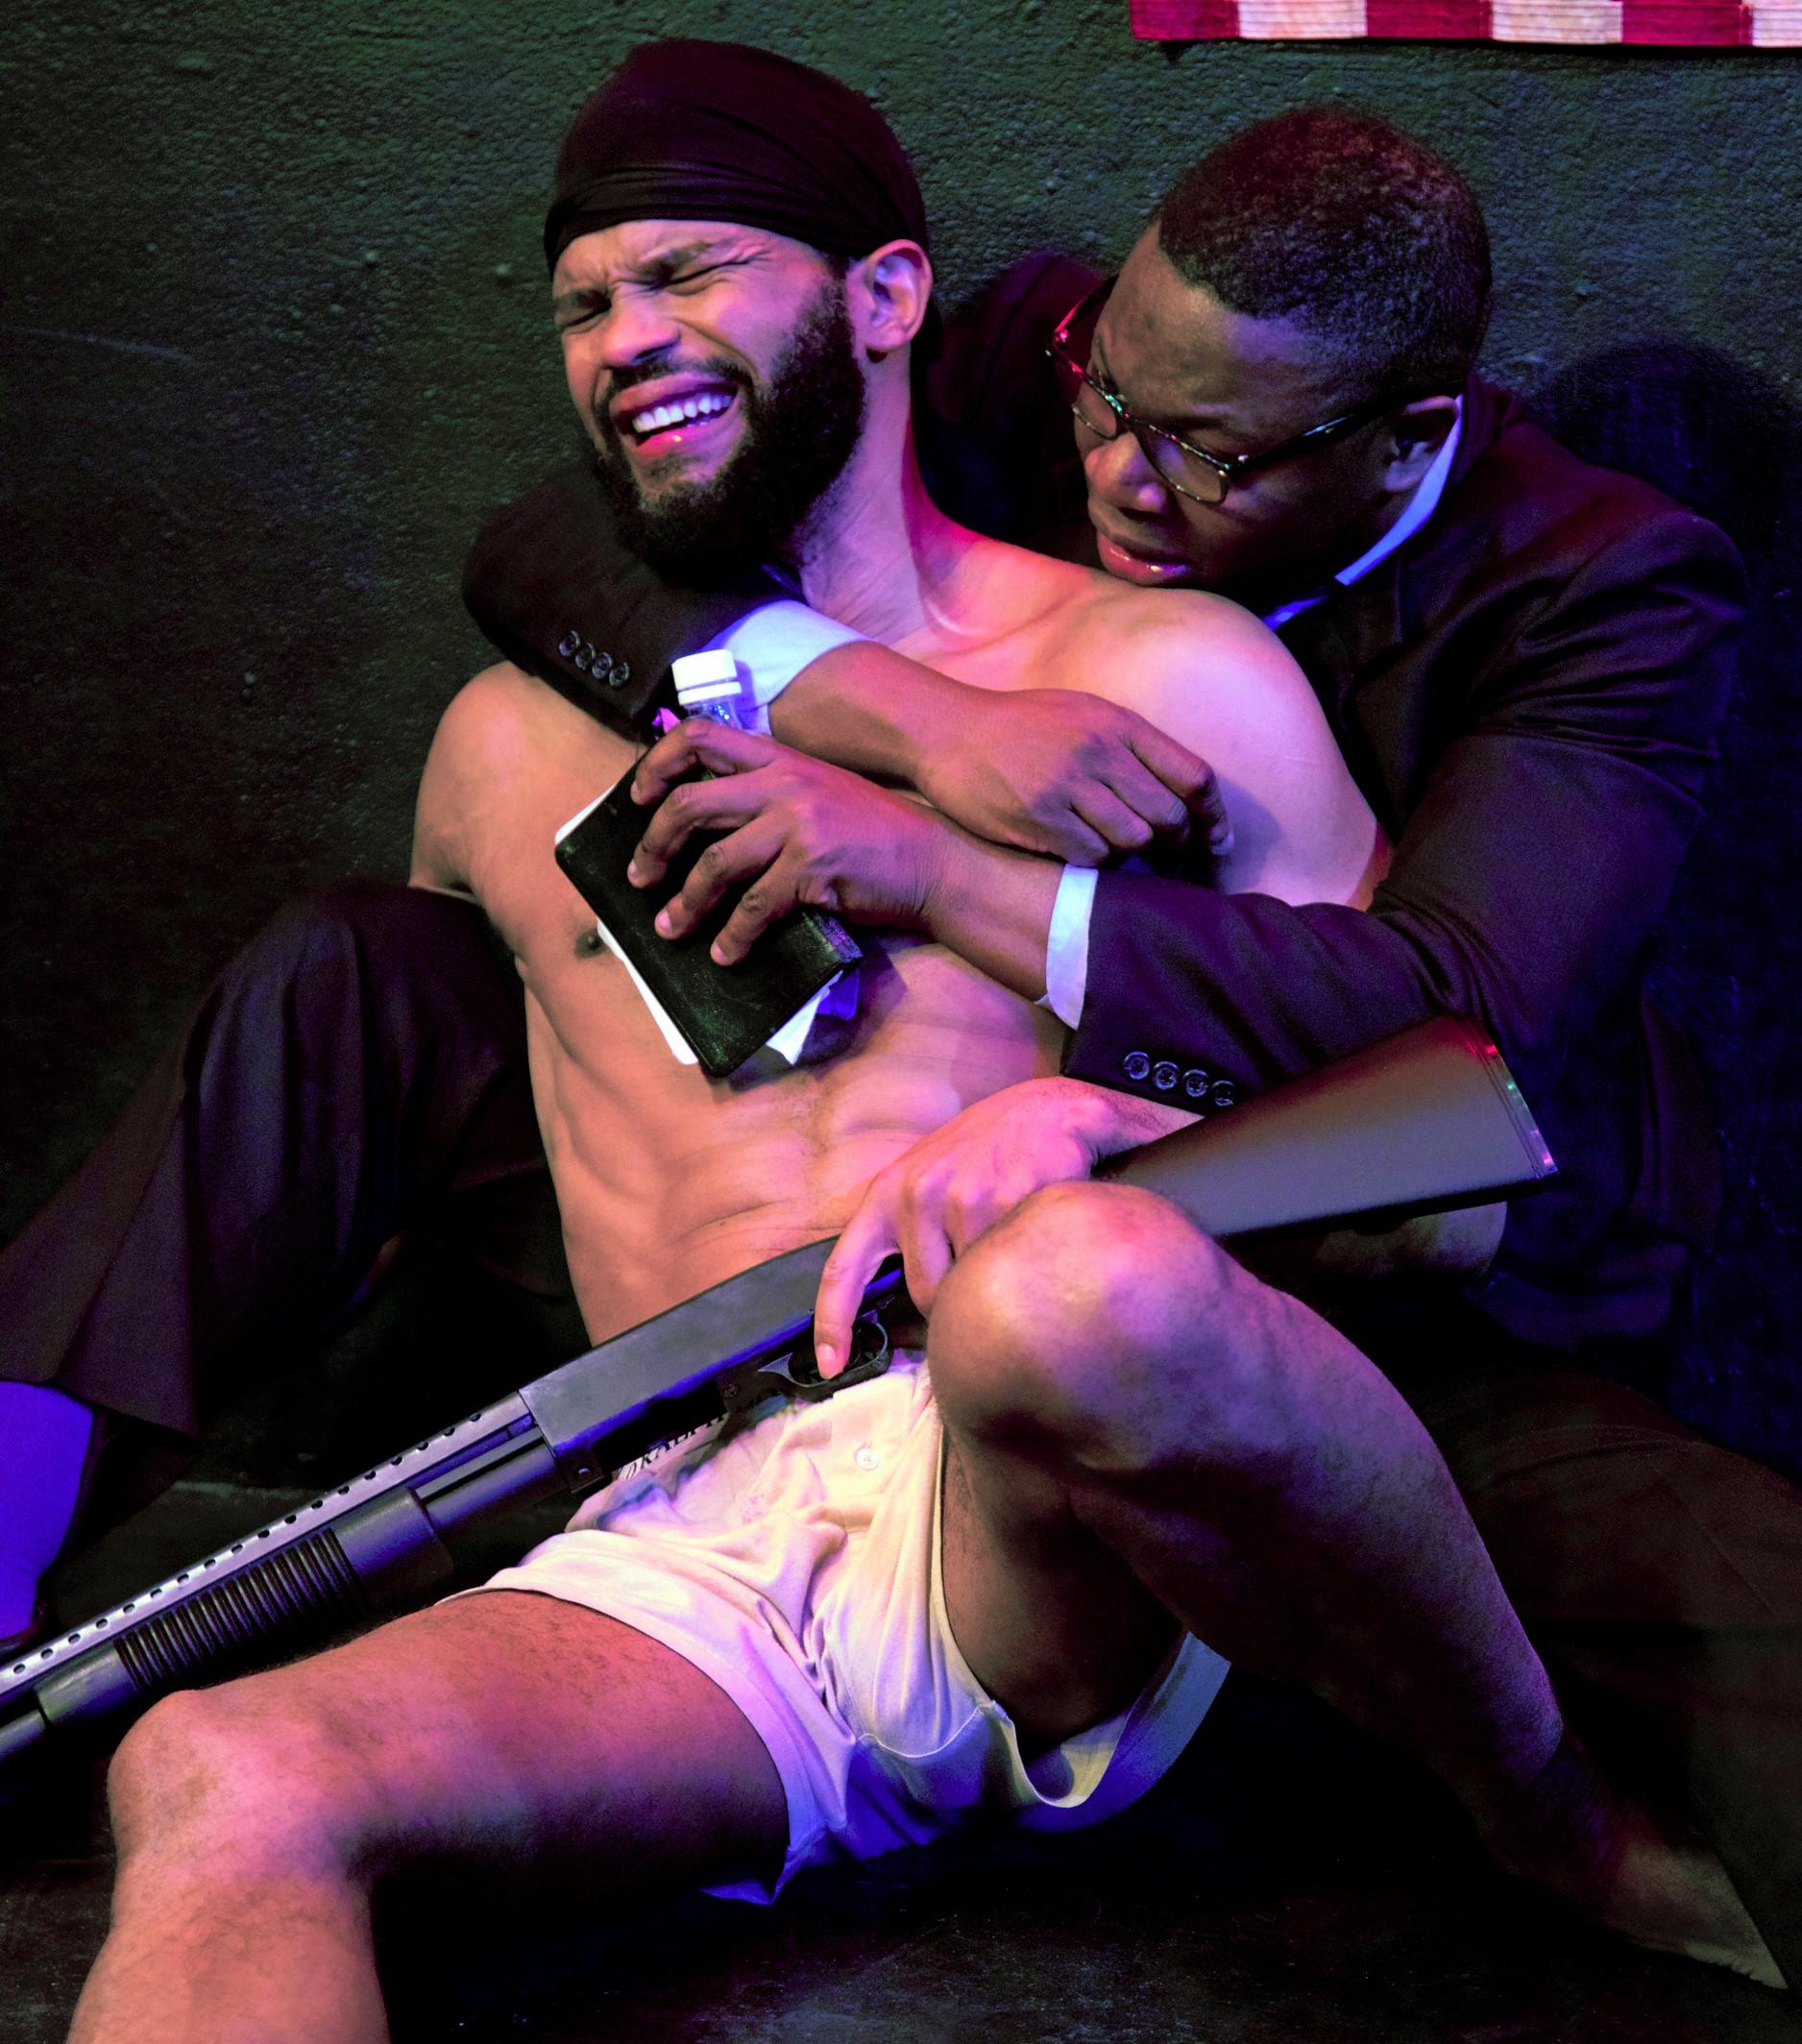 Jim-Bo (Abili) holding his brother Cornbread (Cesar). Photographs by David Zayas Jr.